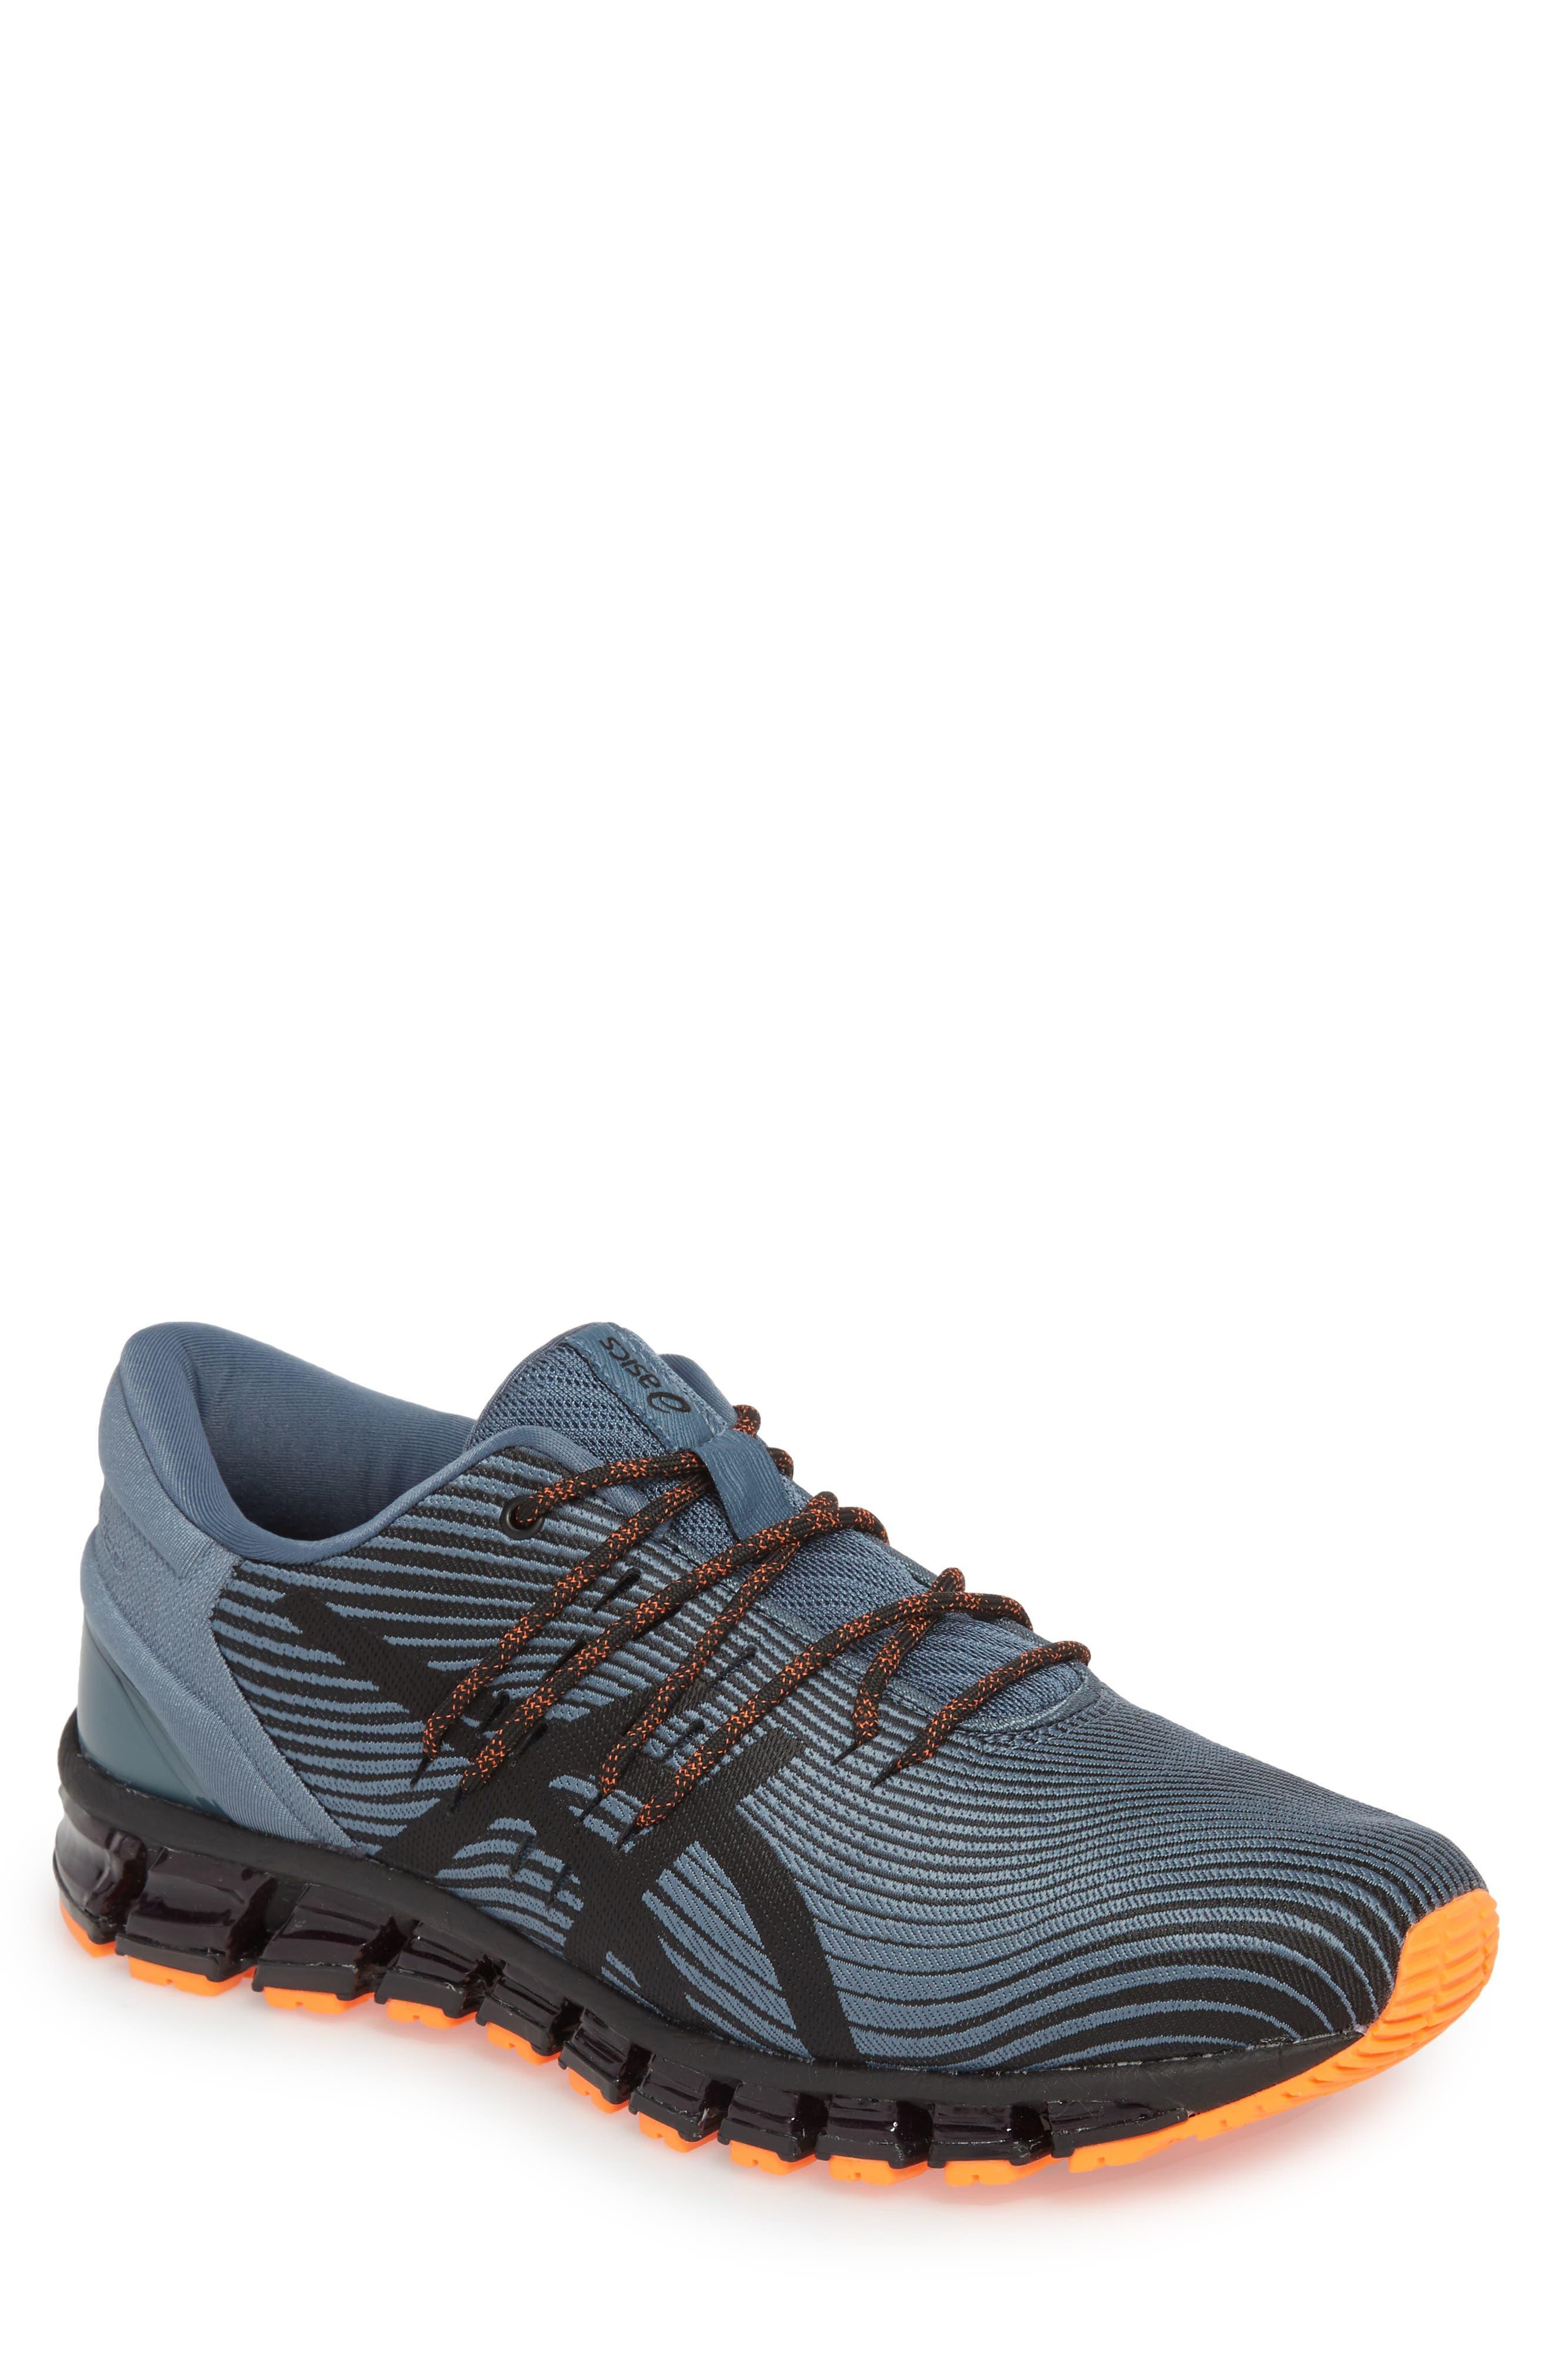 GEL-Quantum 360 4 Running Shoe,                             Main thumbnail 1, color,                             IRON CLAD/ BLACK